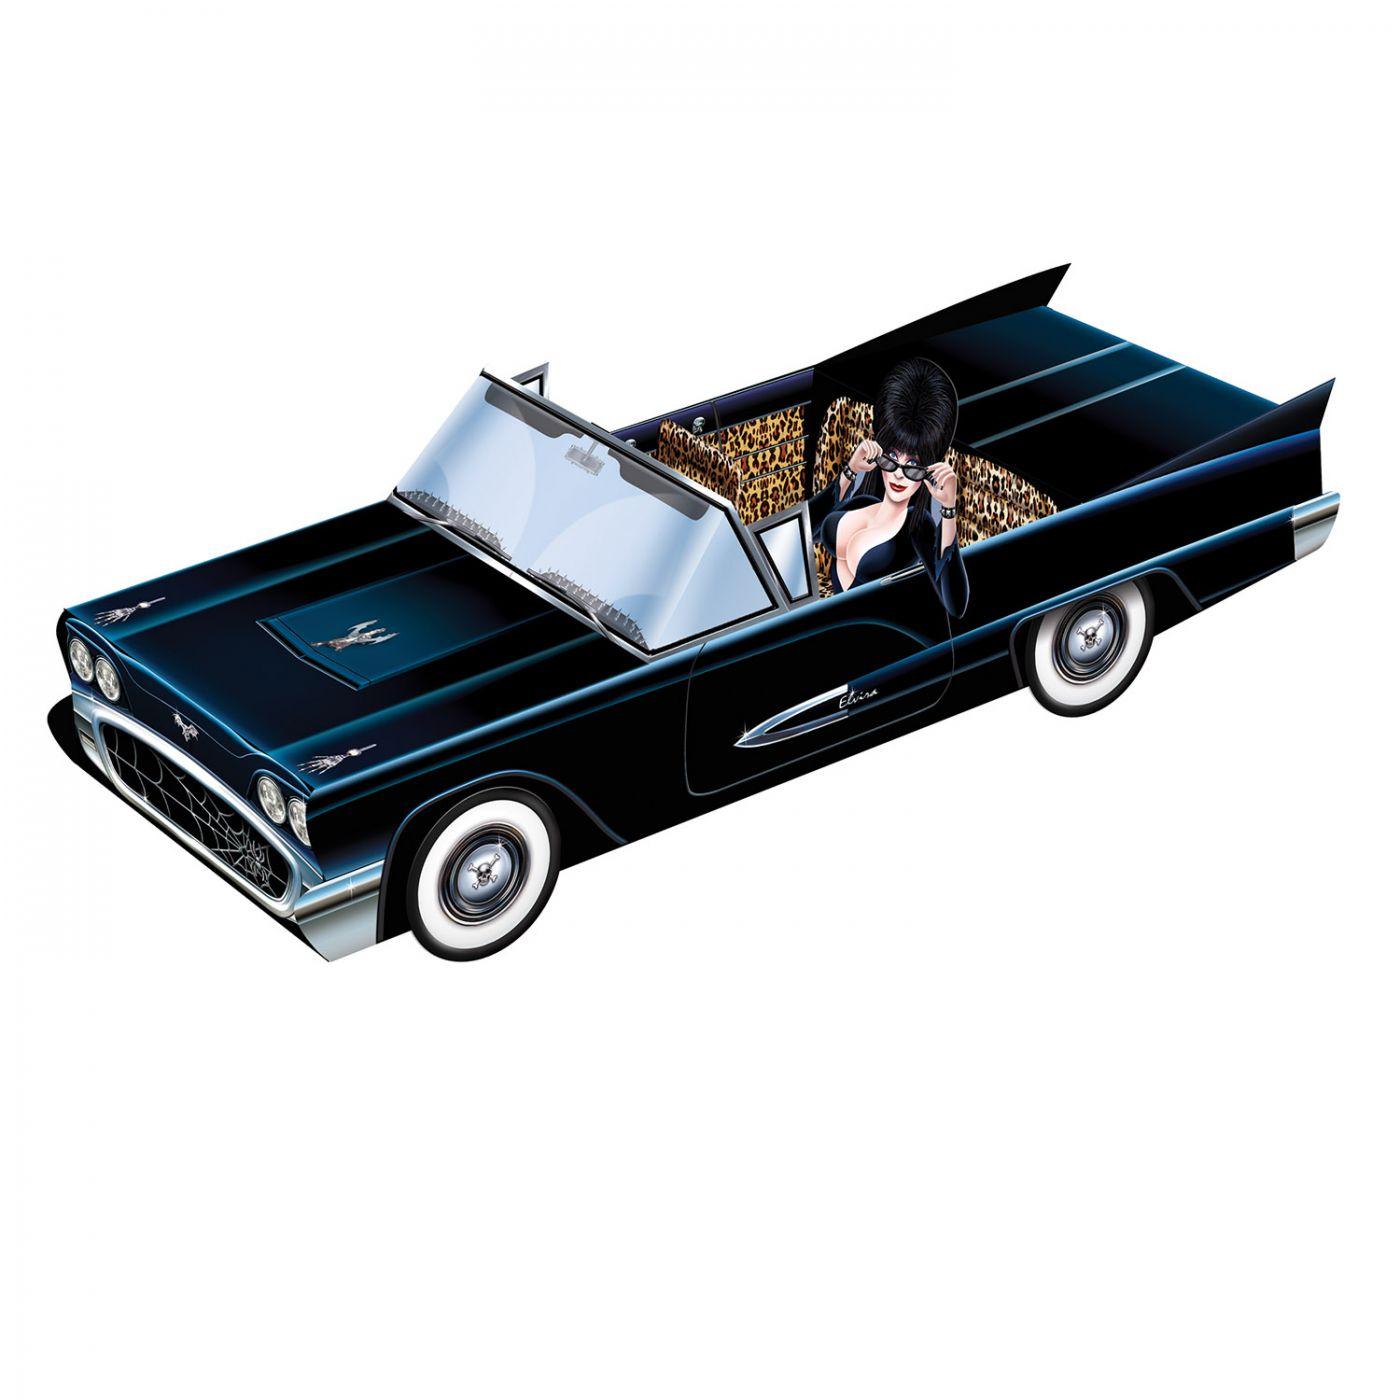 Elvira 3-D Macabre Mobile Centerpiece image